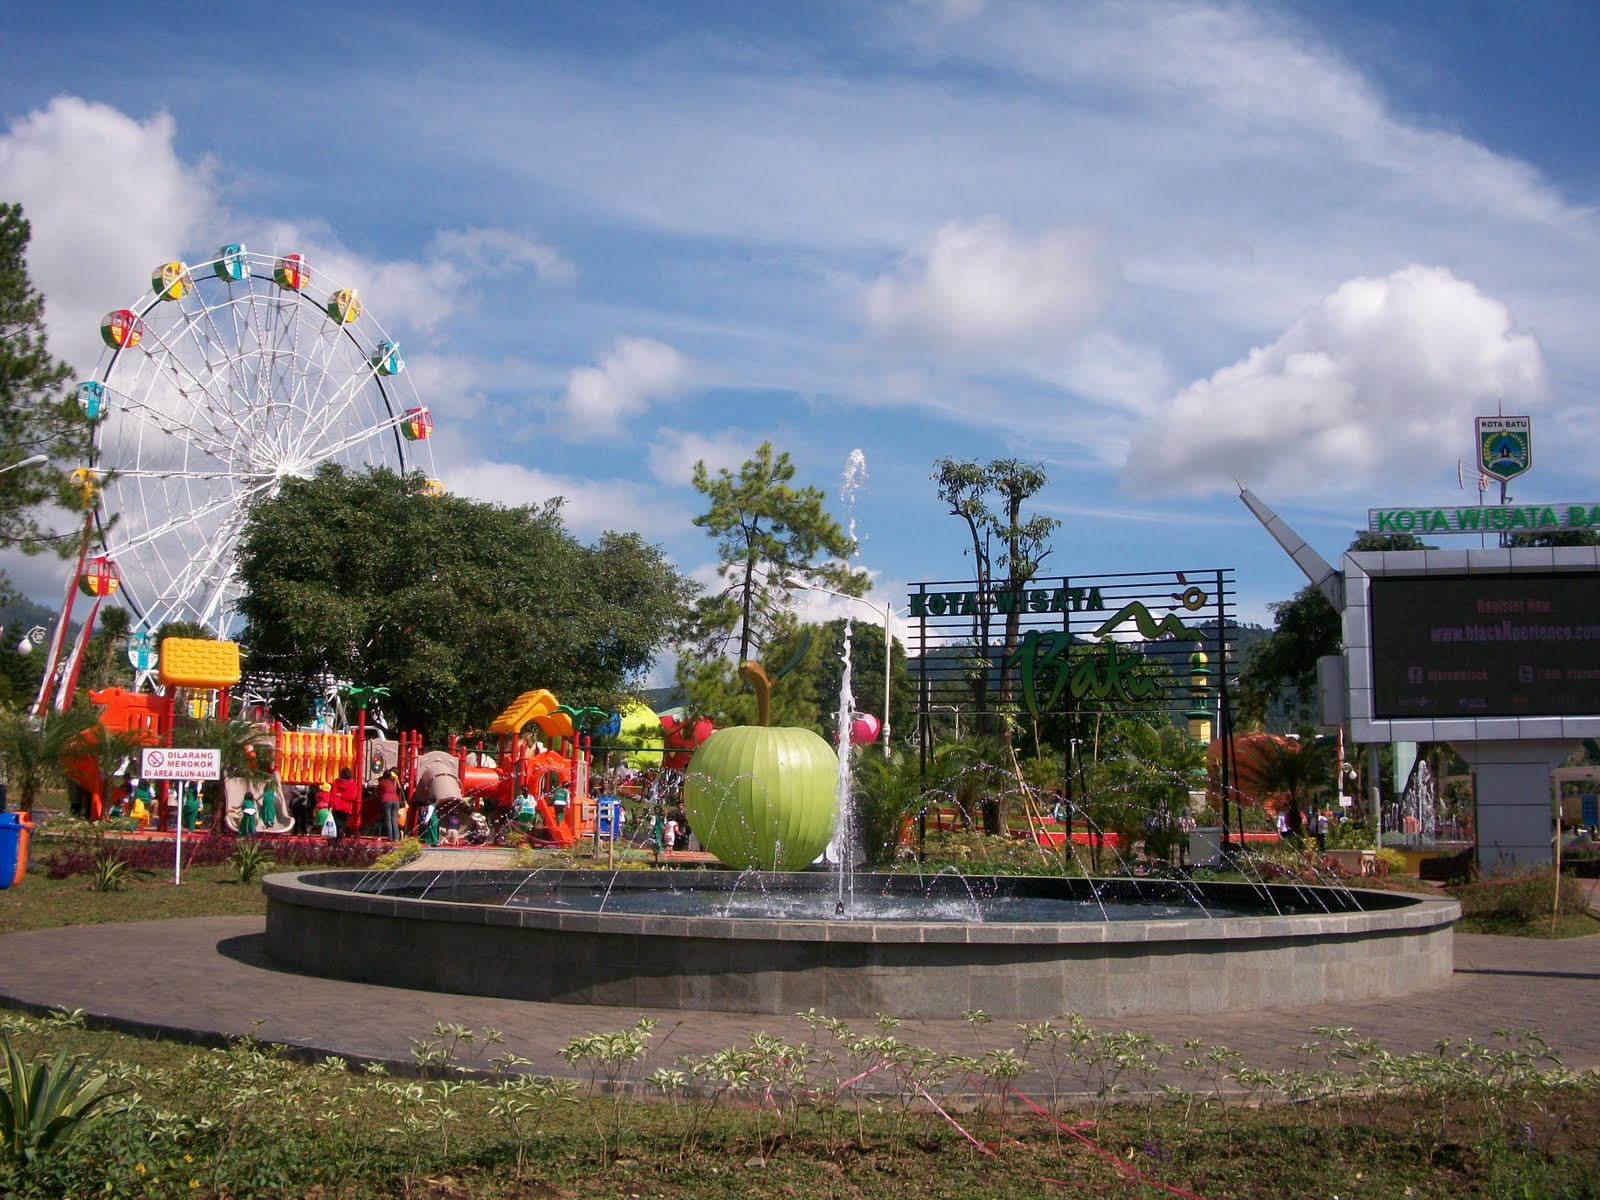 Wisata Malang Batu Sehari Wisata Jatim Park Batu Malang